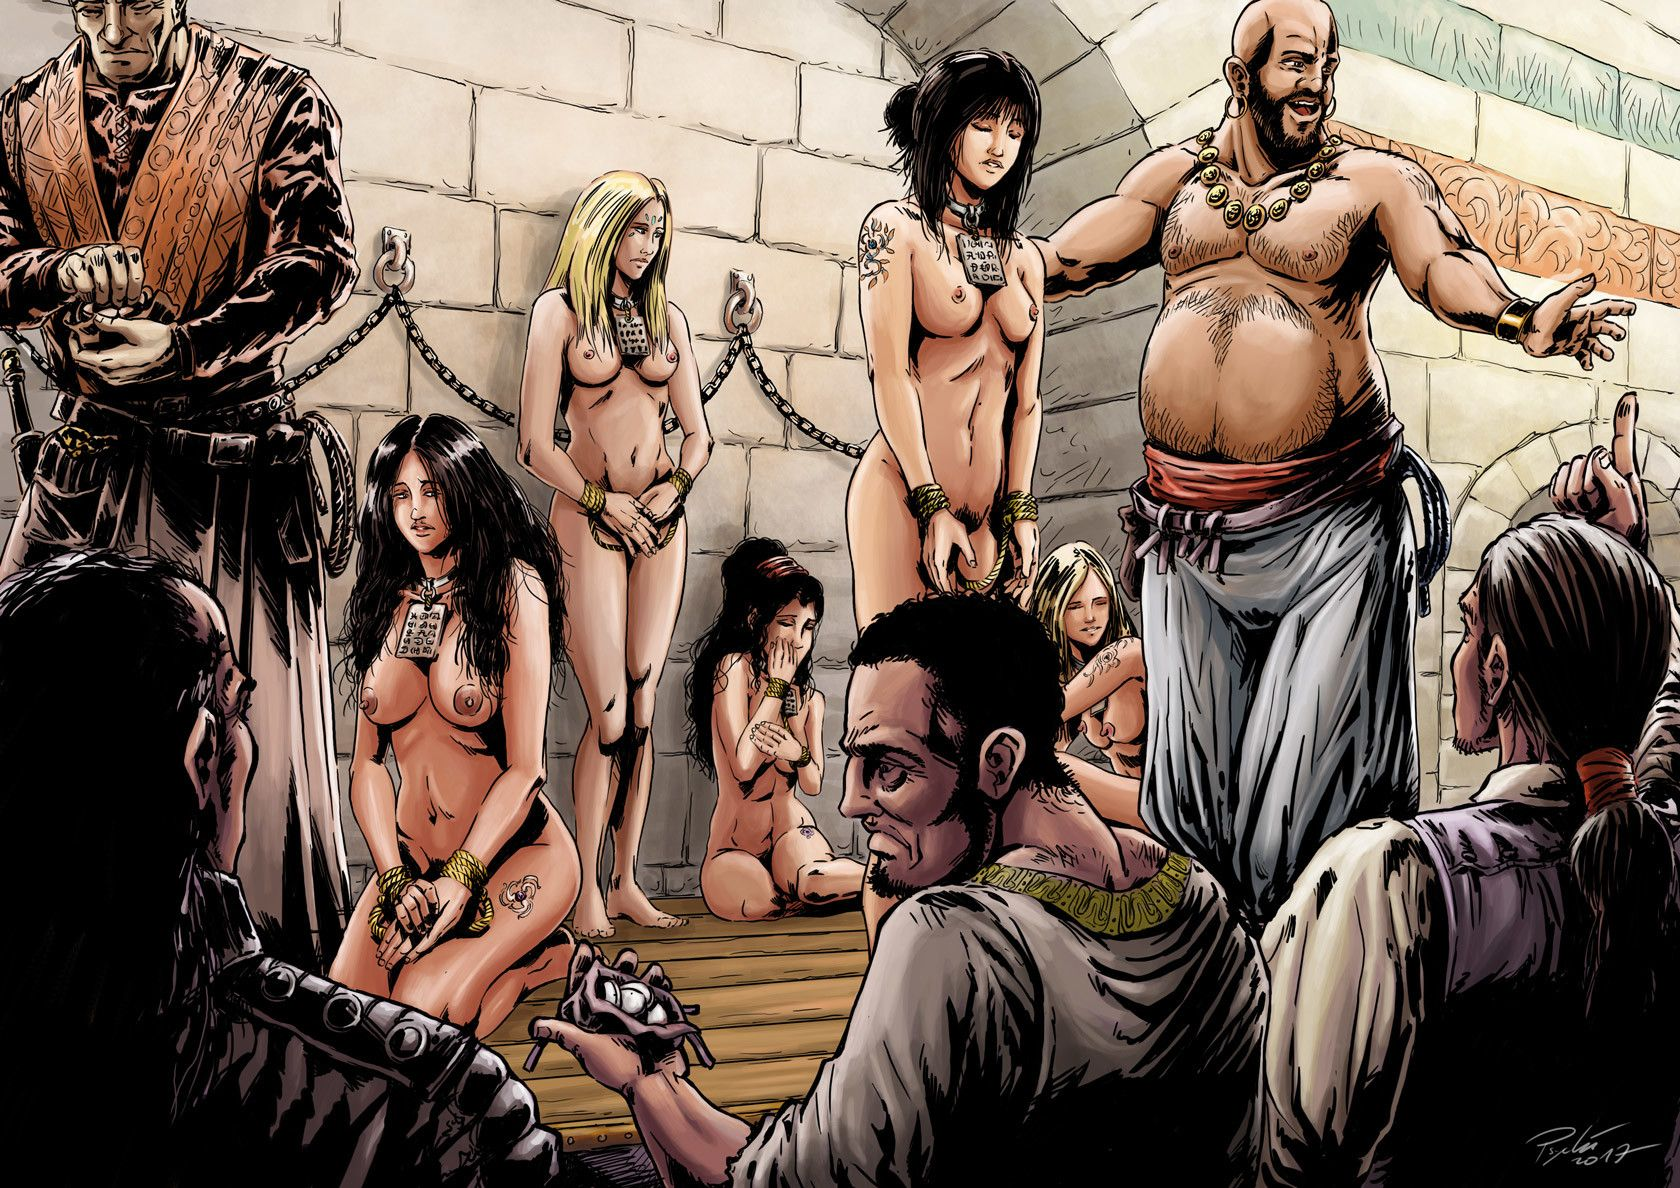 John personswhite slave trade